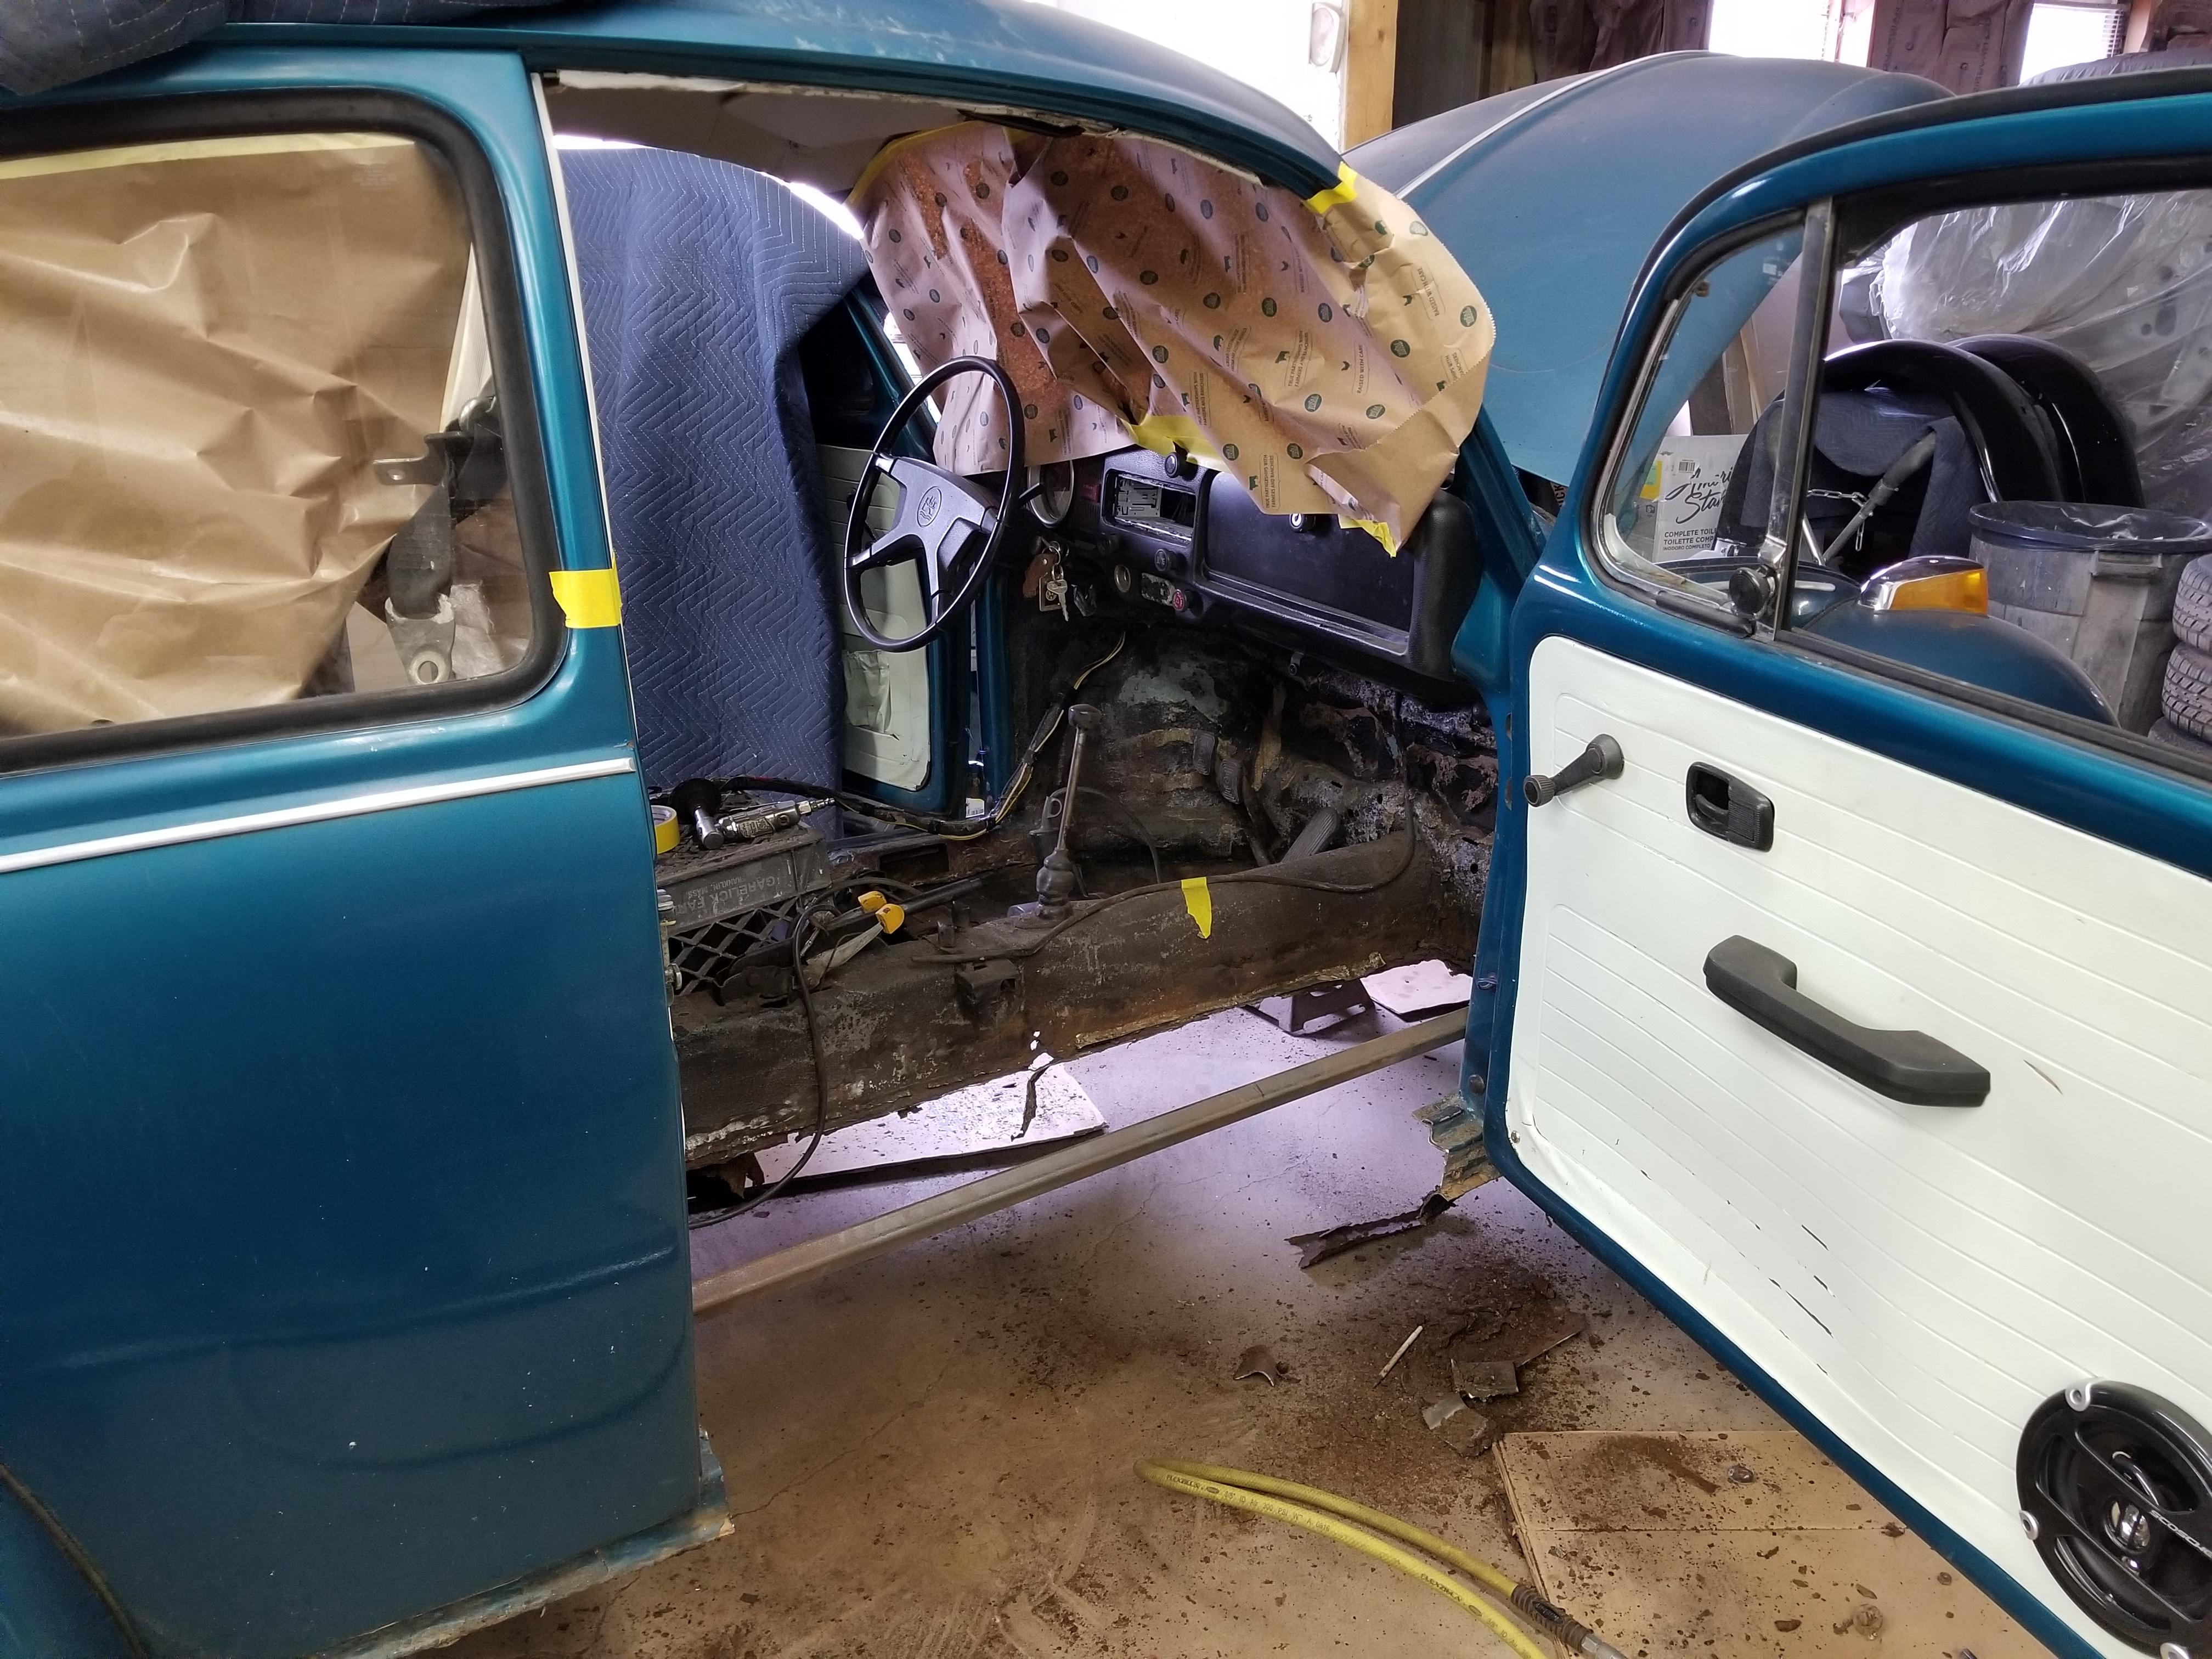 1974 Beetle Restoration